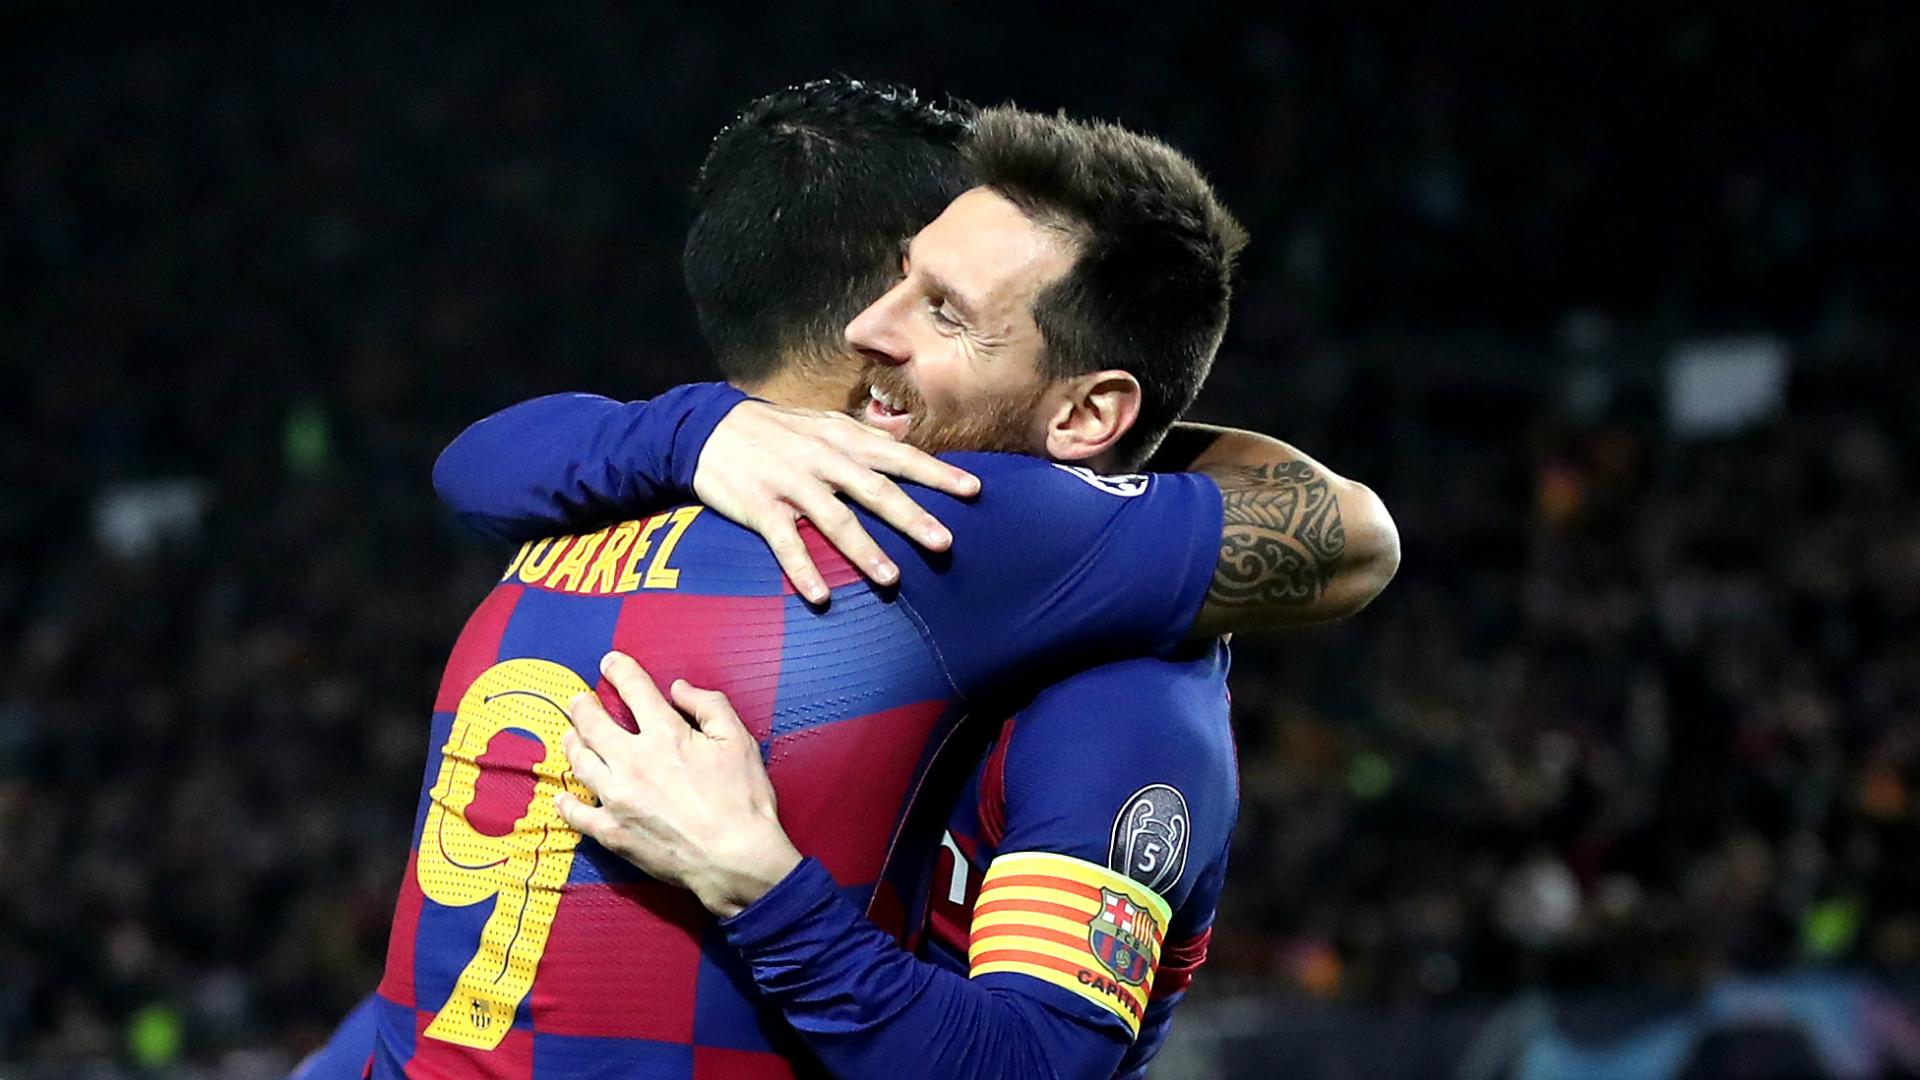 Barcelona 3-1 Borussia Dortmund: Qualification sealed by Suarez, Messi and Griezmann